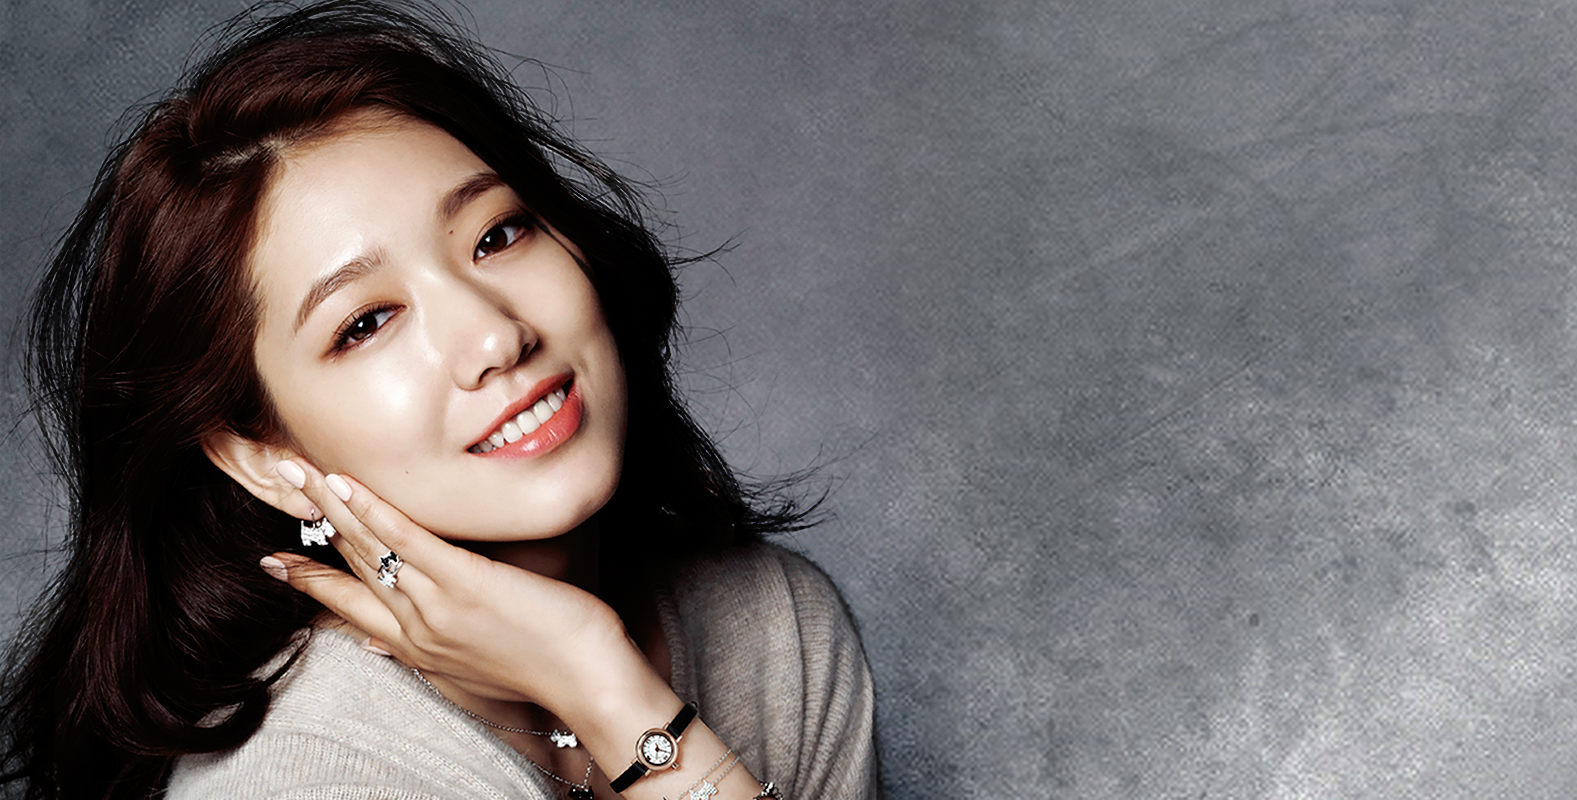 Yoo Hye Jung The Doctor